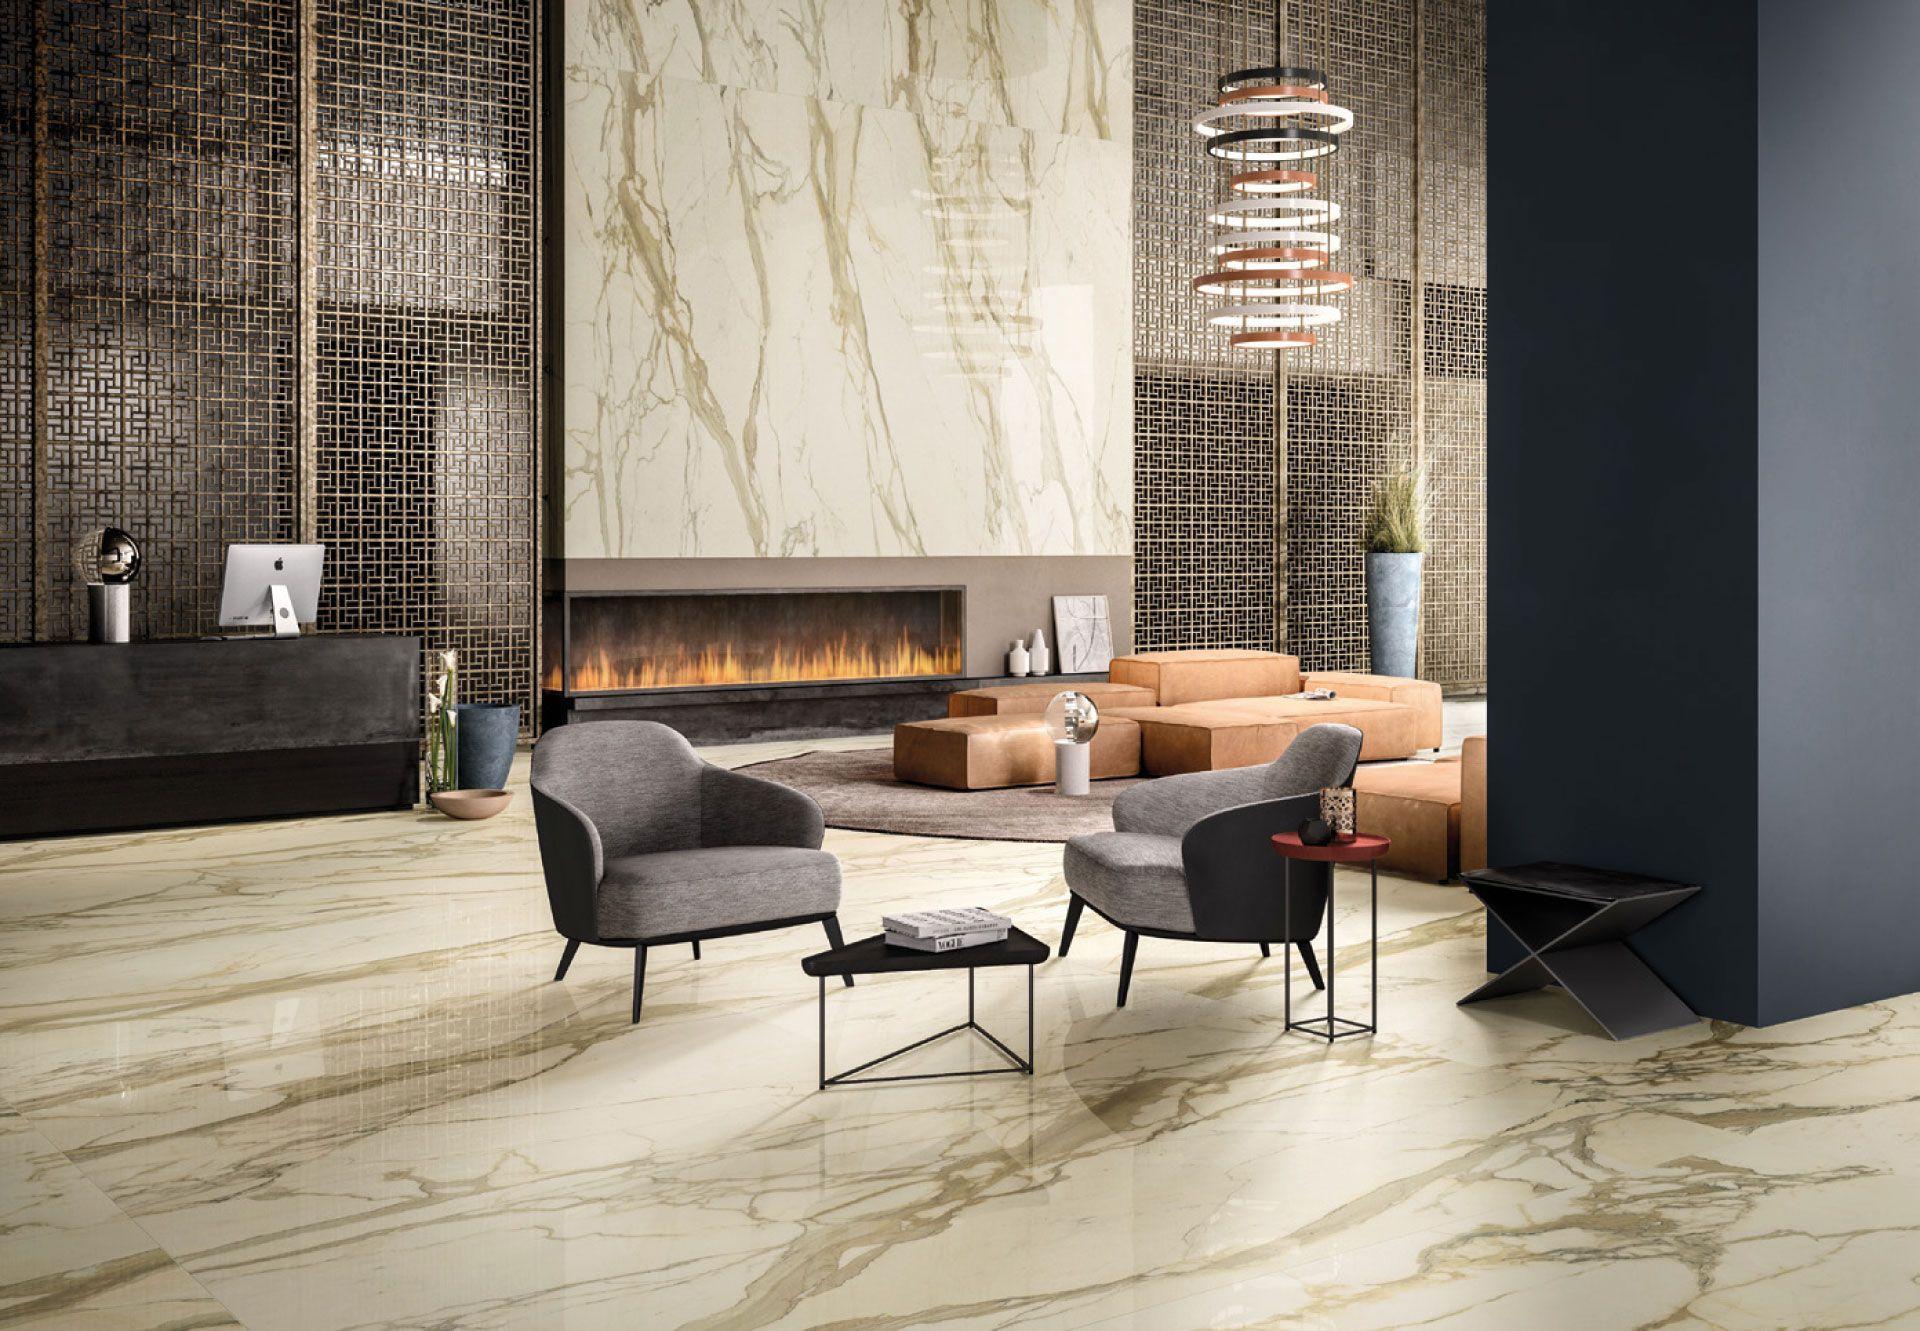 Mercer island luxury waterfront estate idesignarch interior design - New Renderings Of Muse Sunny Isles Released Design 01 Pinterest Luxury Condo Condos And Interiors